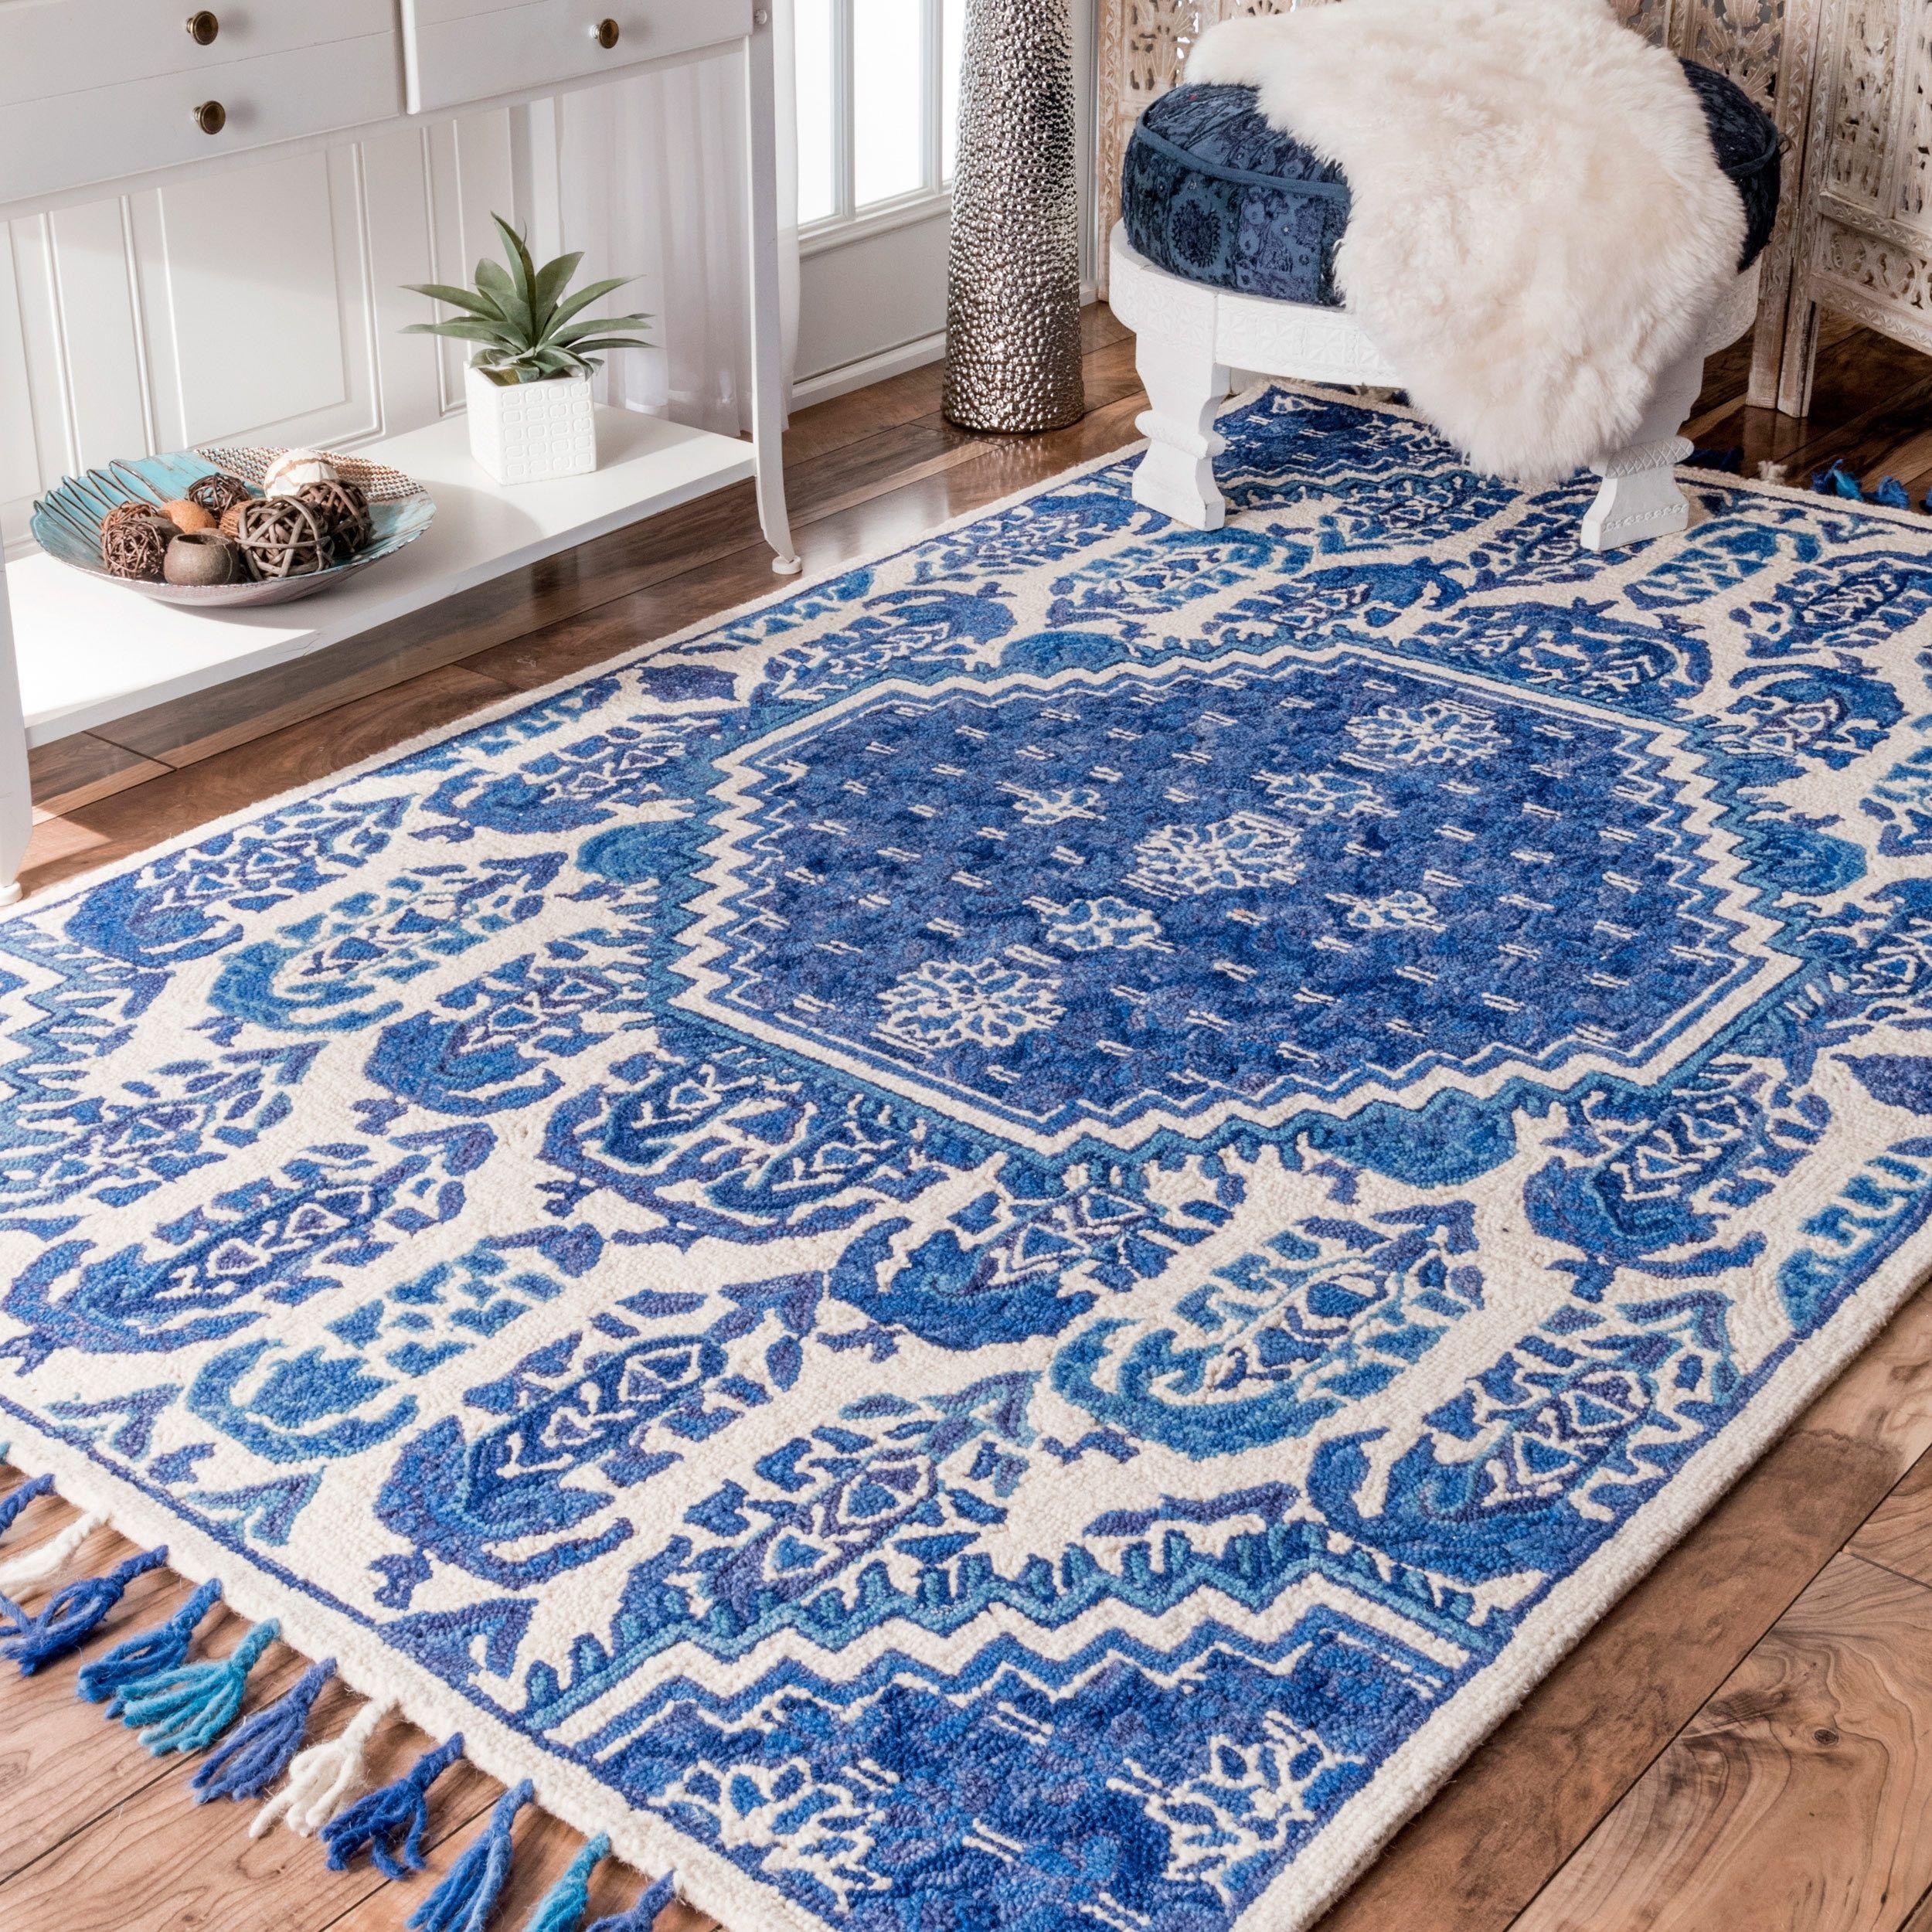 rug for living room size%0A nuLOOM Handmade Tufted Wool Paisley Tassel Blue Rug    u      x   u